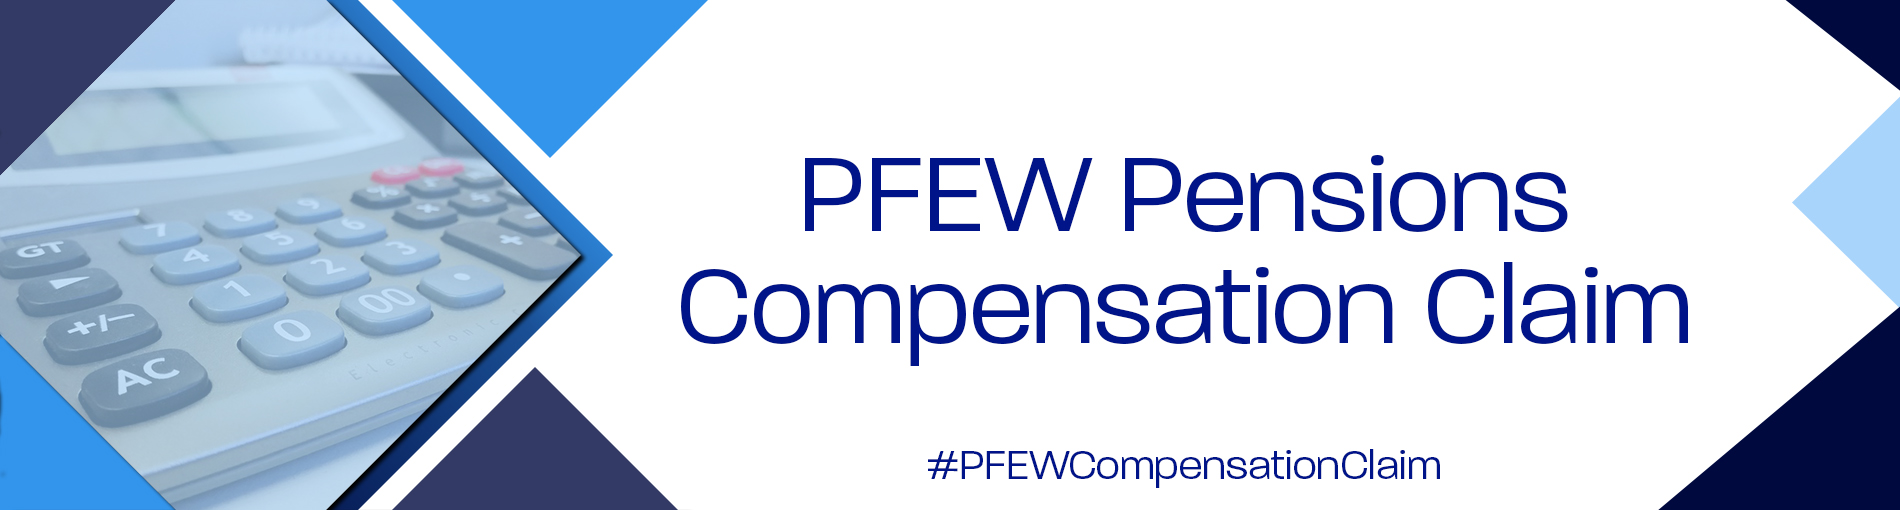 PFEW Pensions Compensation Claim